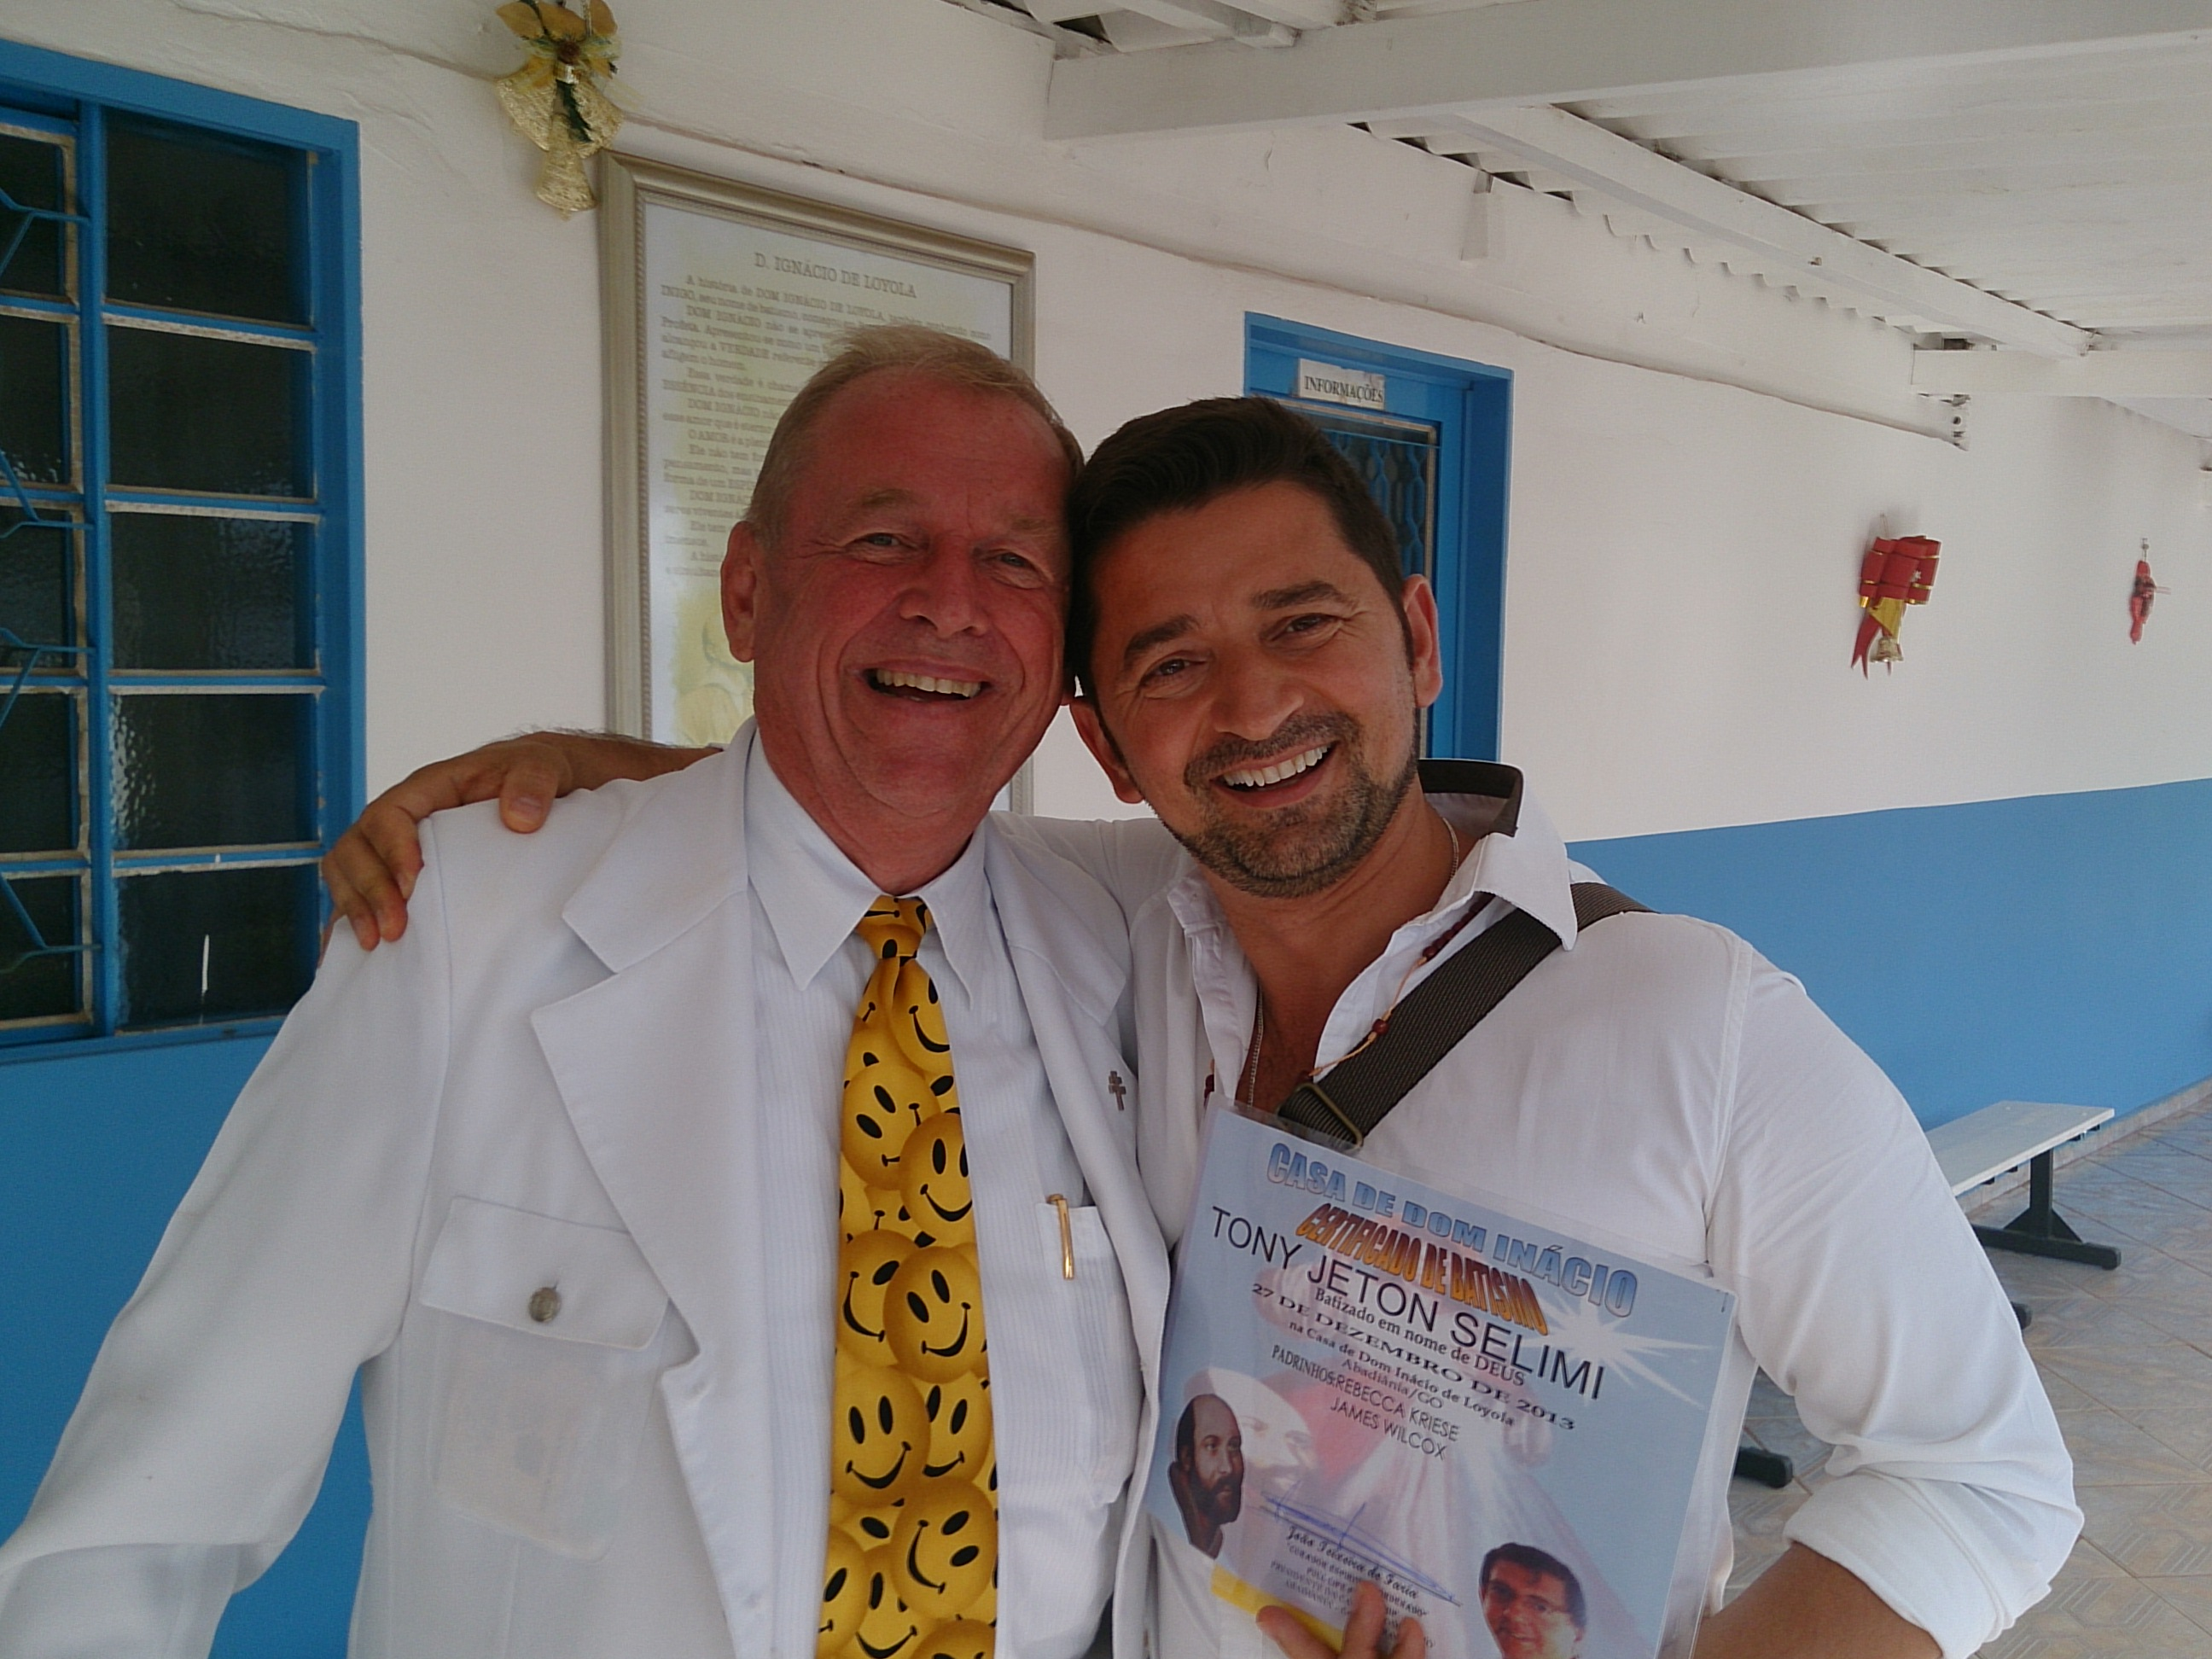 Tony J Selimi at the Casa dom Ignacio